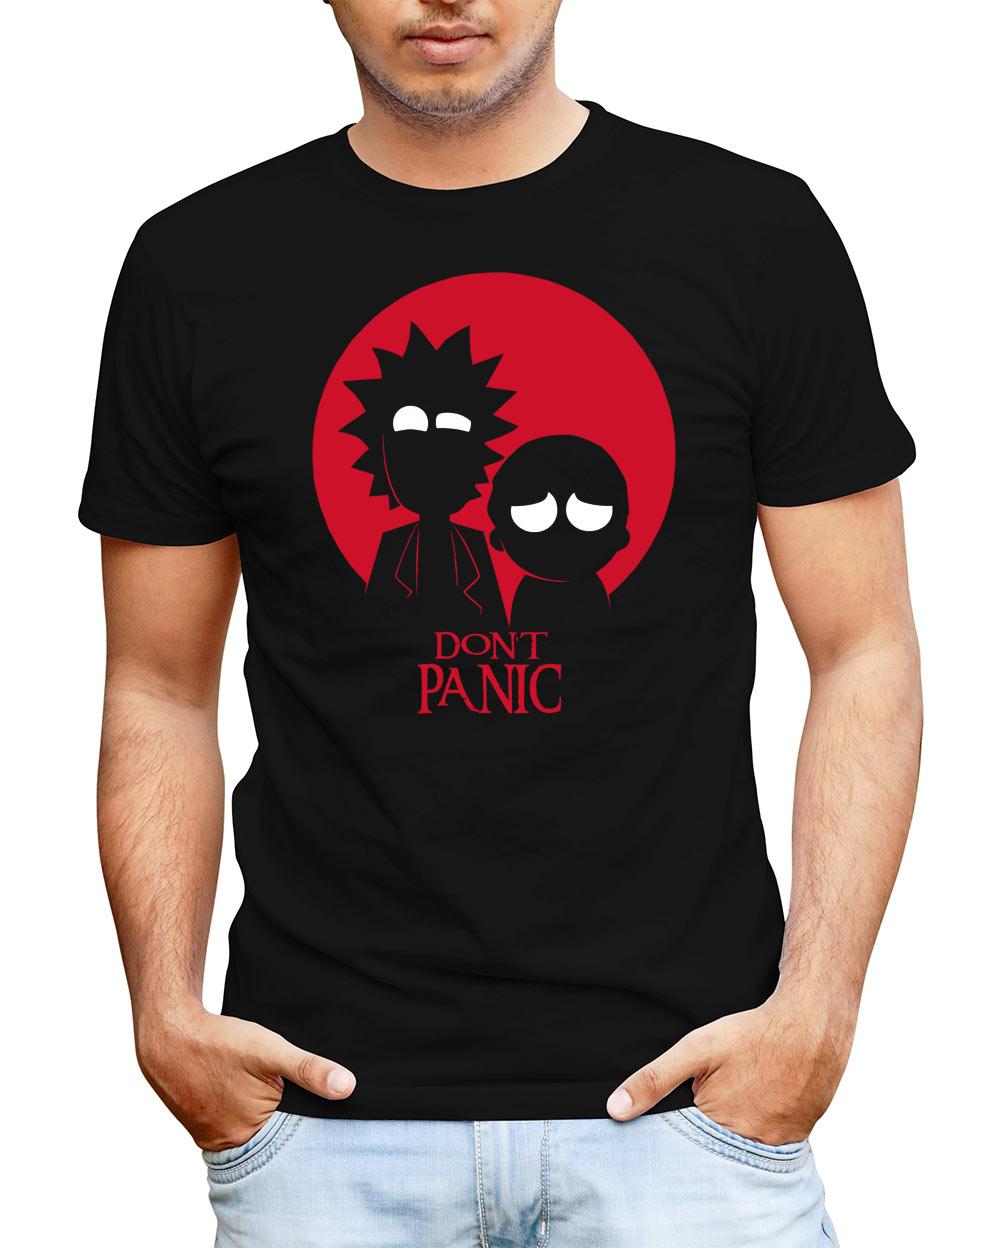 Camiseta Rick y Morty Don't Panic